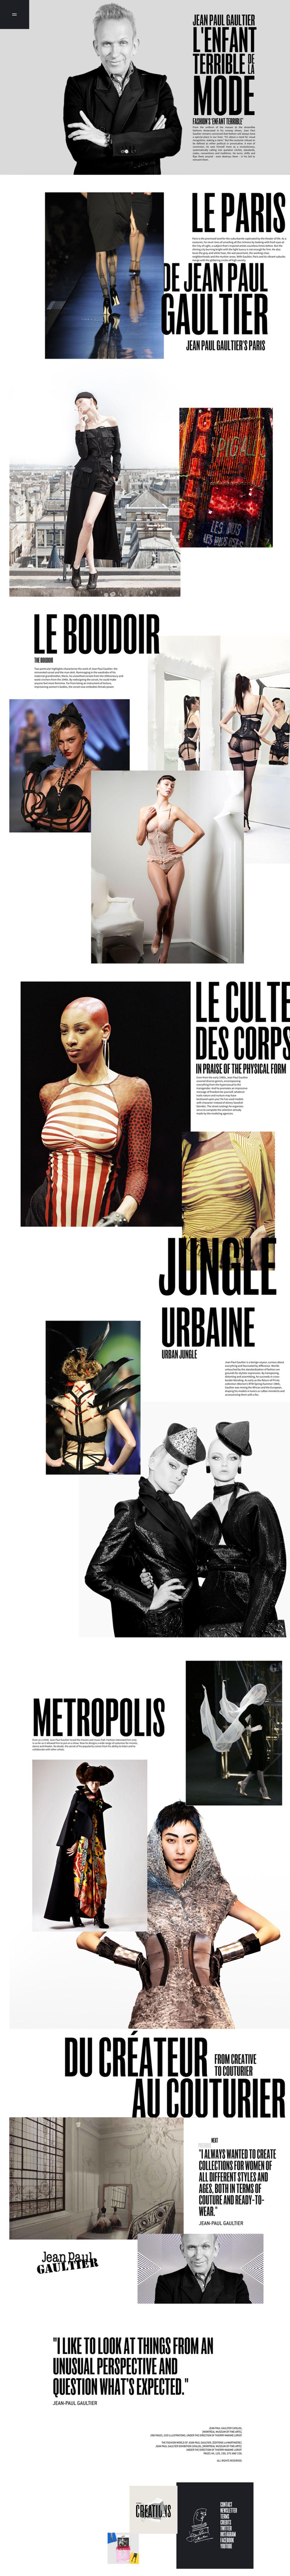 Jean Paul Gaultier Gorgeous Homepage Design